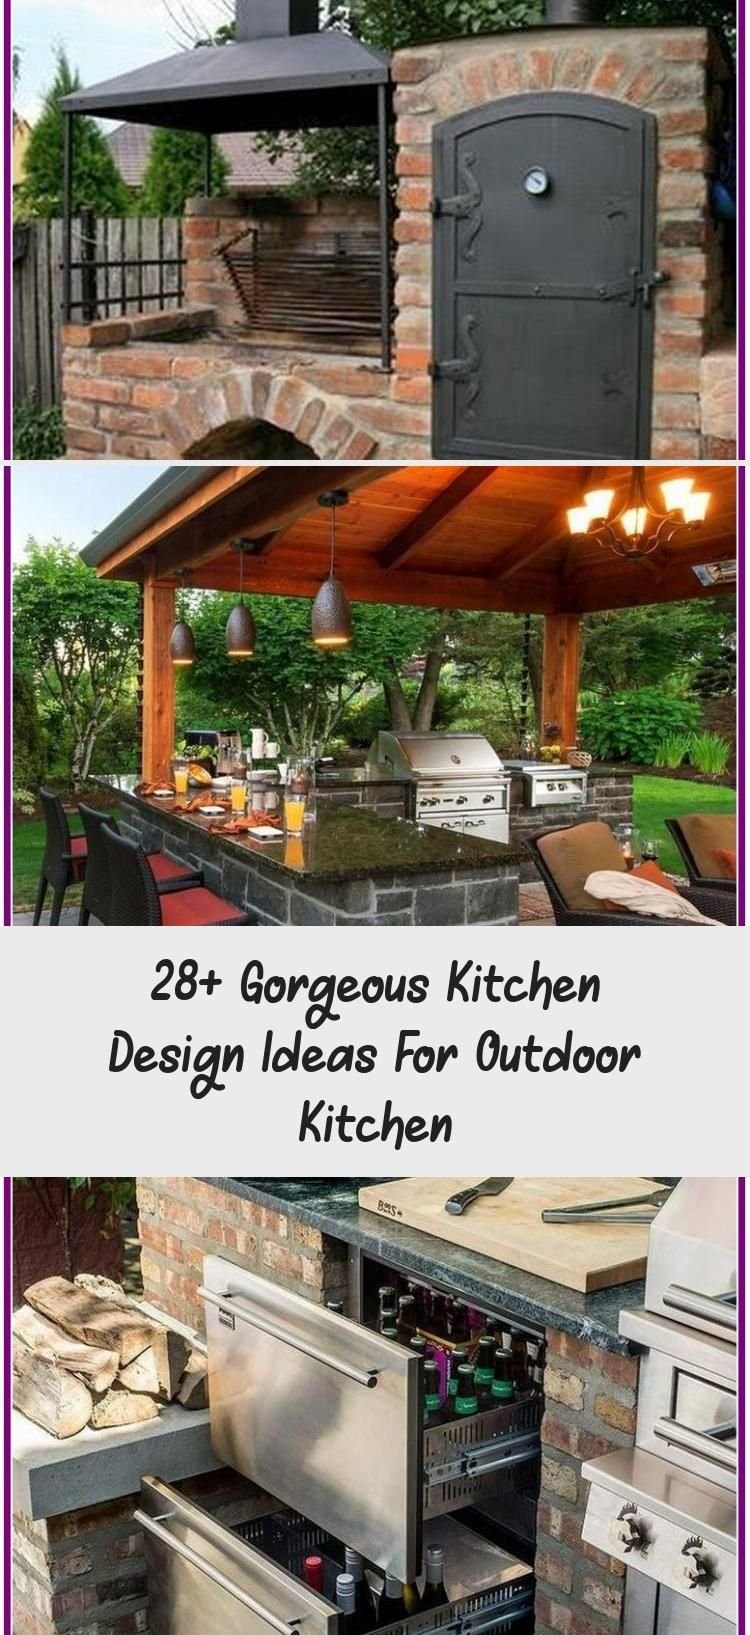 28 Gorgeous Kitchen Design Ideas For Outdoor Kitchen In 2020 Gorgeous Kitchens Kitchen Design Outdoor Kitchen Island